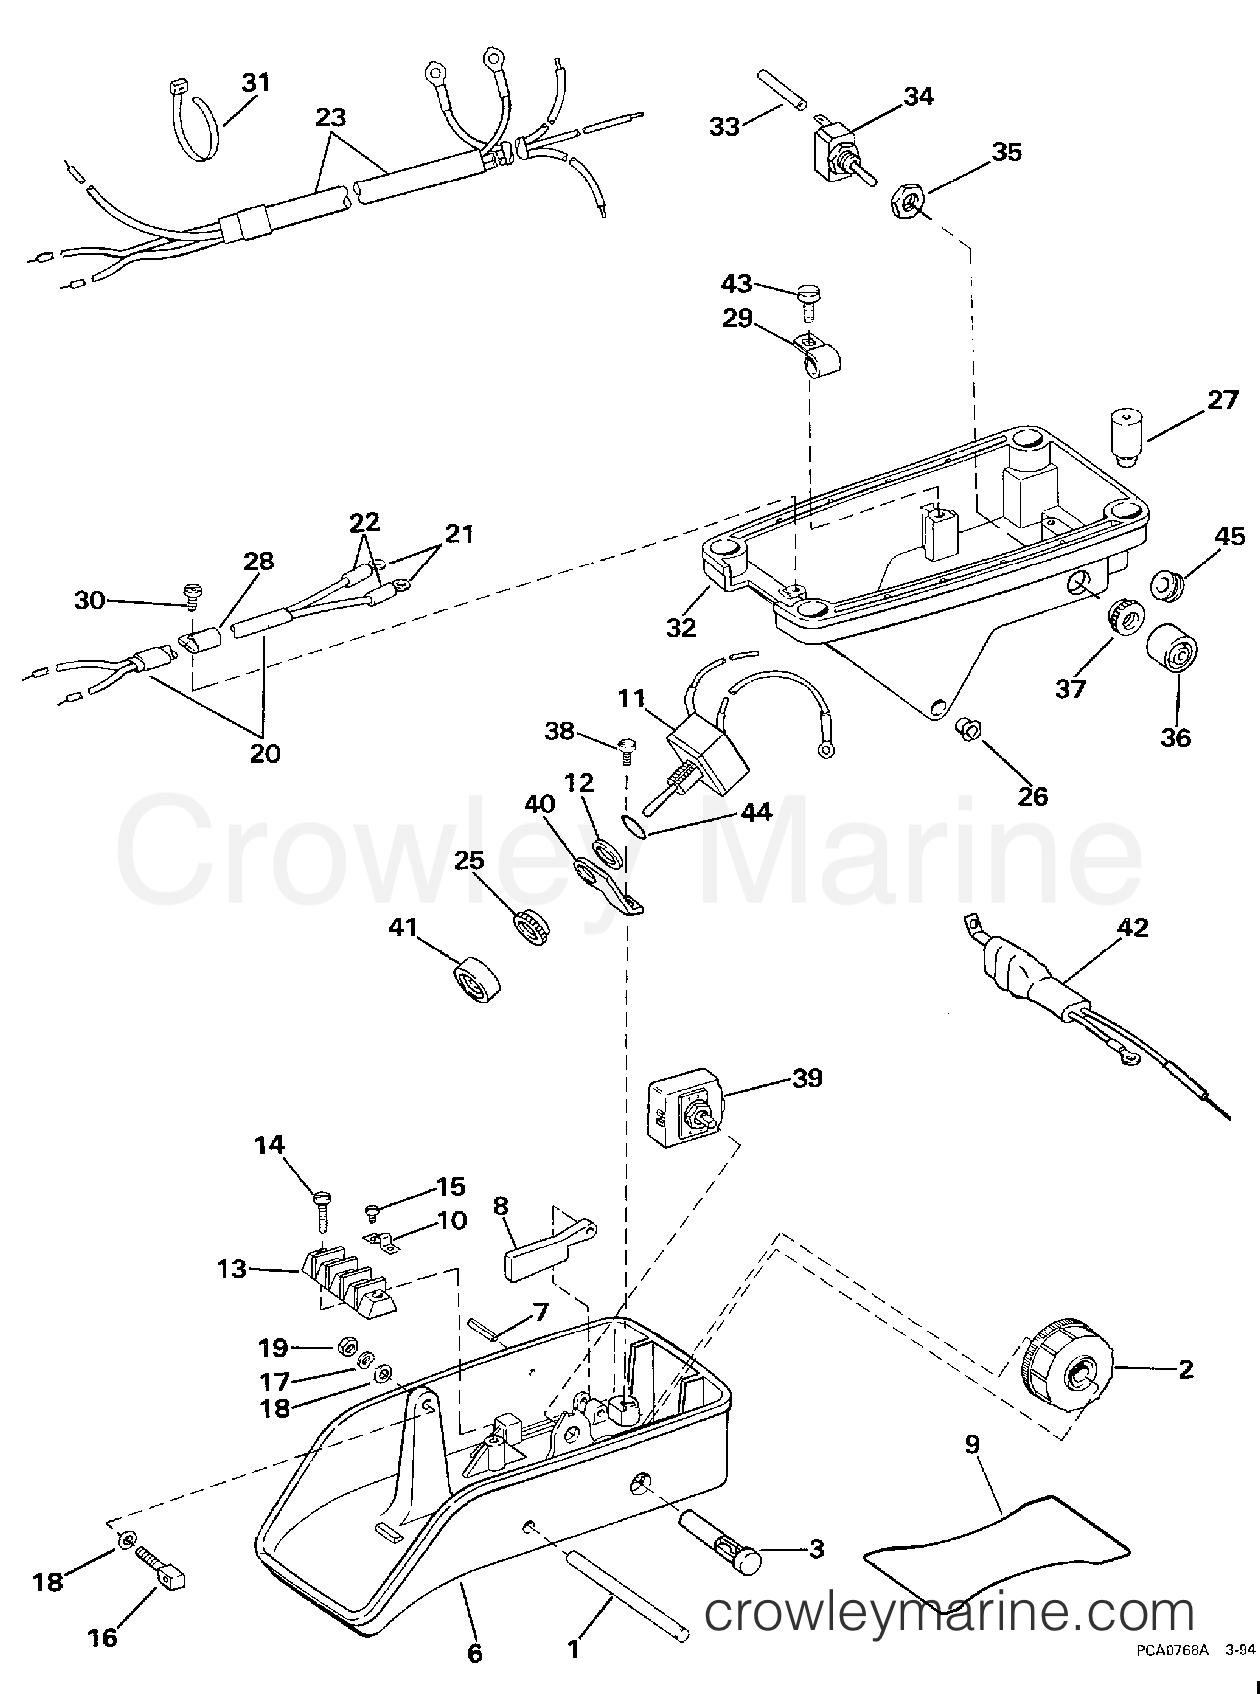 1997 Electric Motors 24 Volt - BFX4TPV - PEDAL GROUP - STANDARD